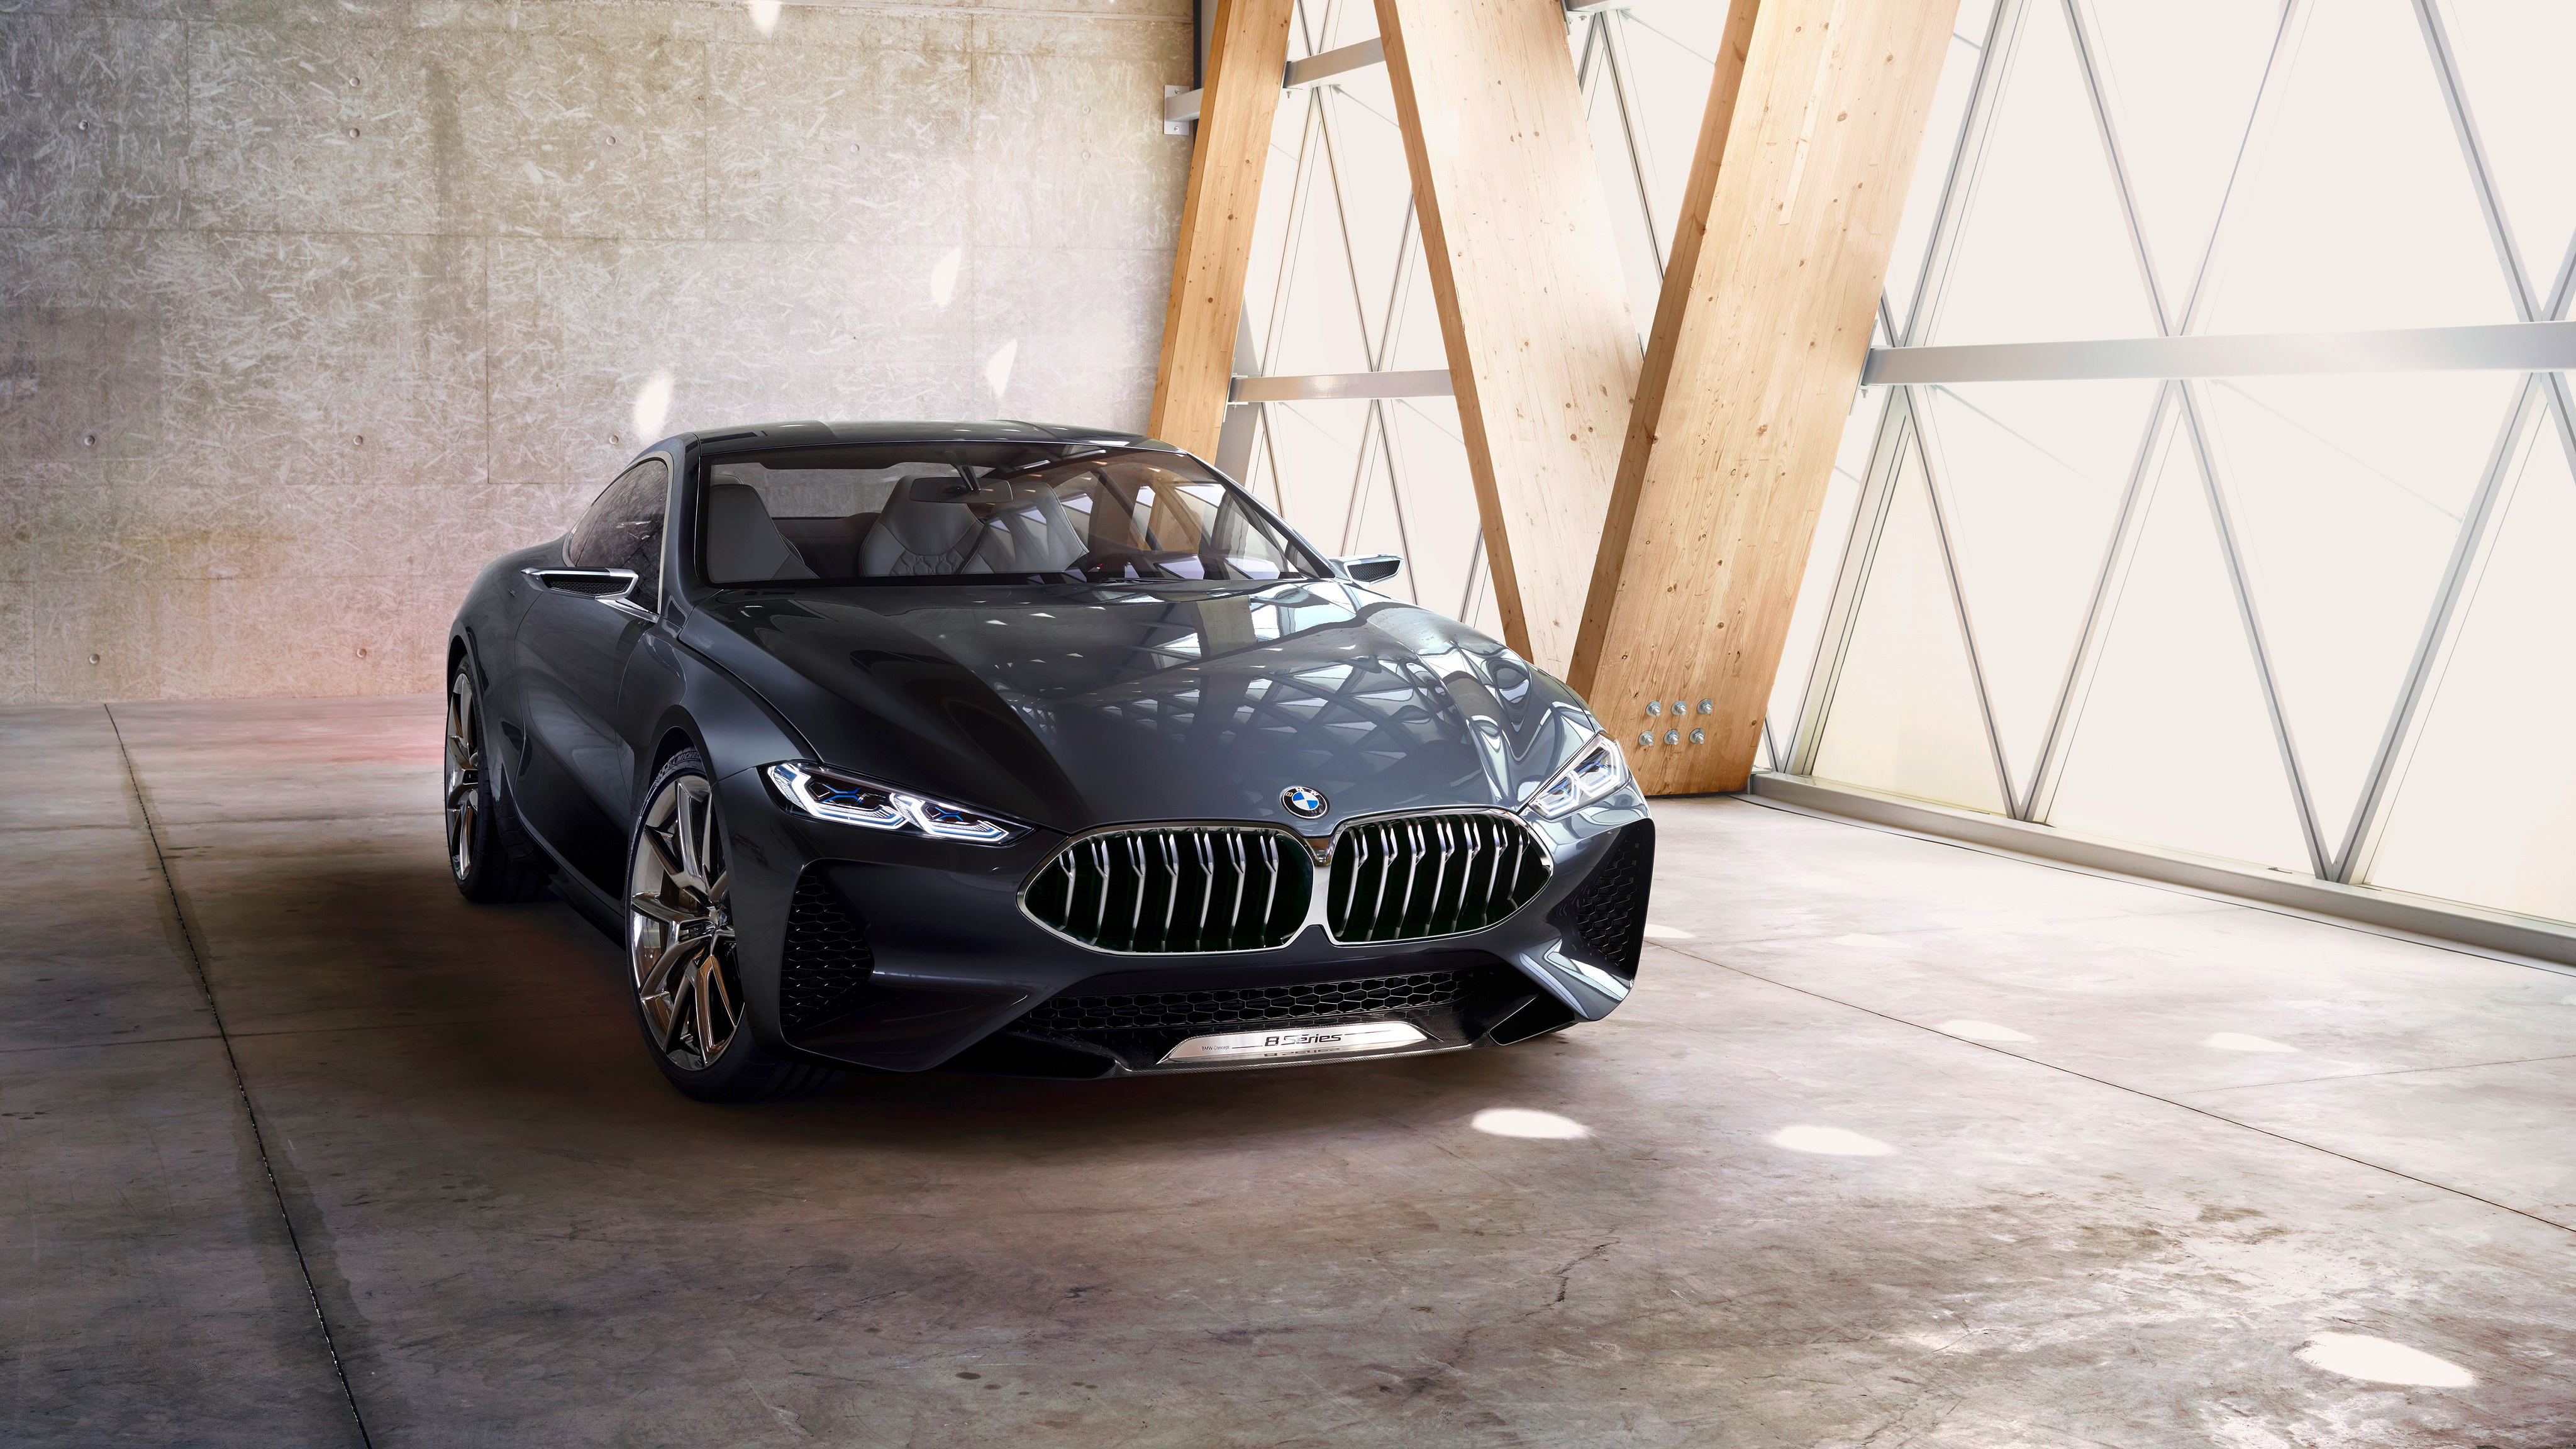 BMW Concept 8 Series 4K Wallpaper   HD Car Wallpapers   ID ...